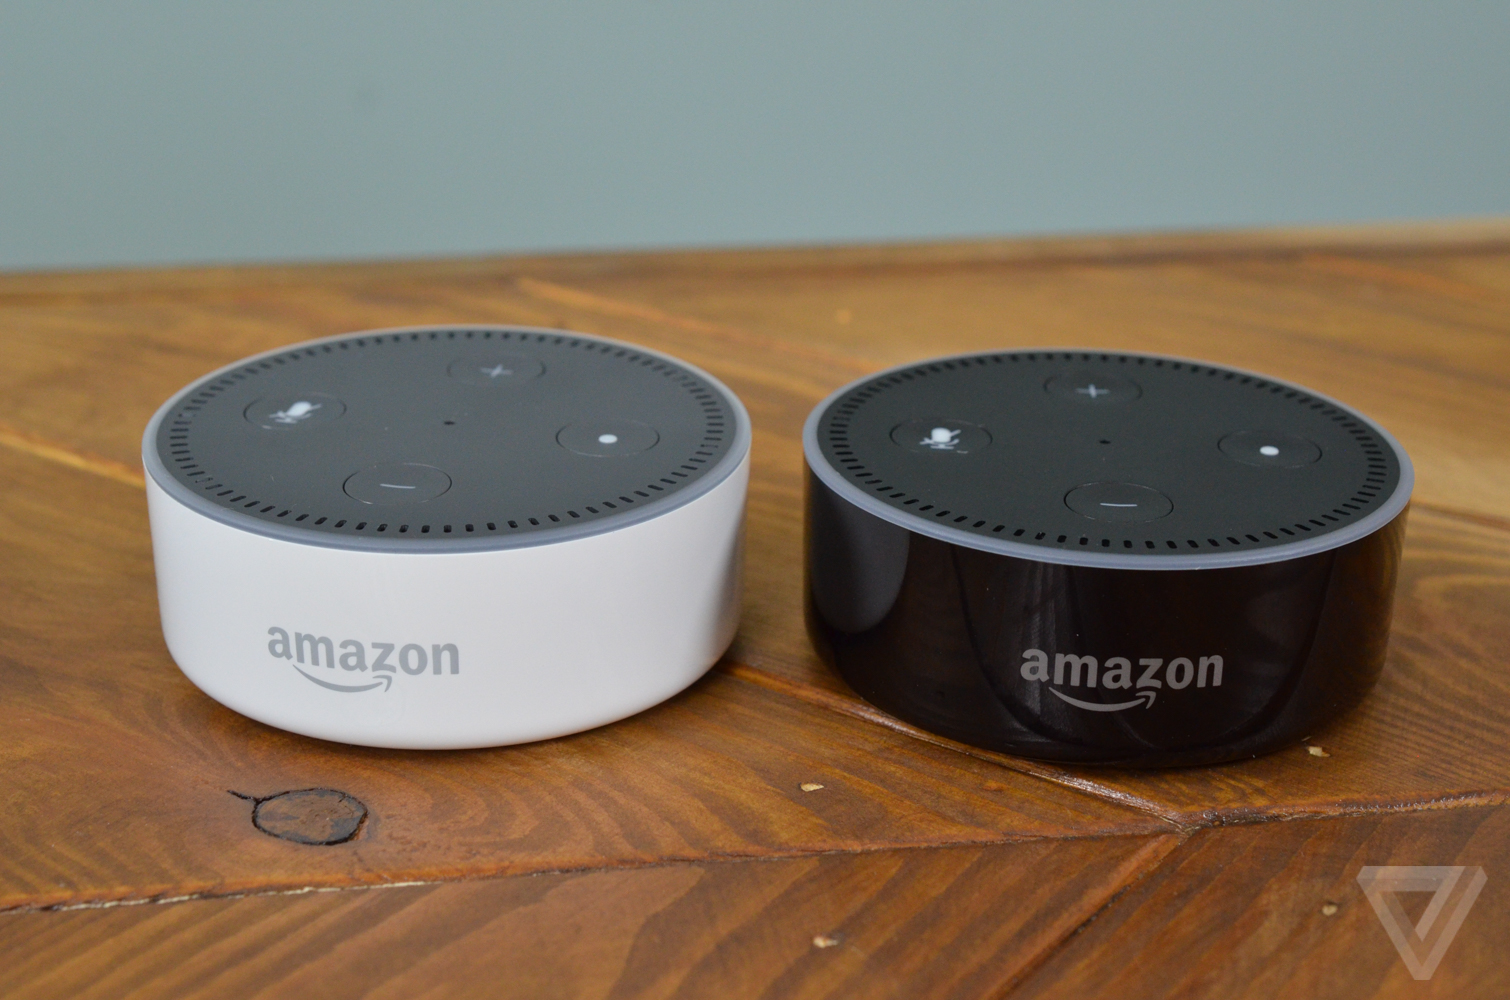 Amazon Dot Echo white hands-on photos